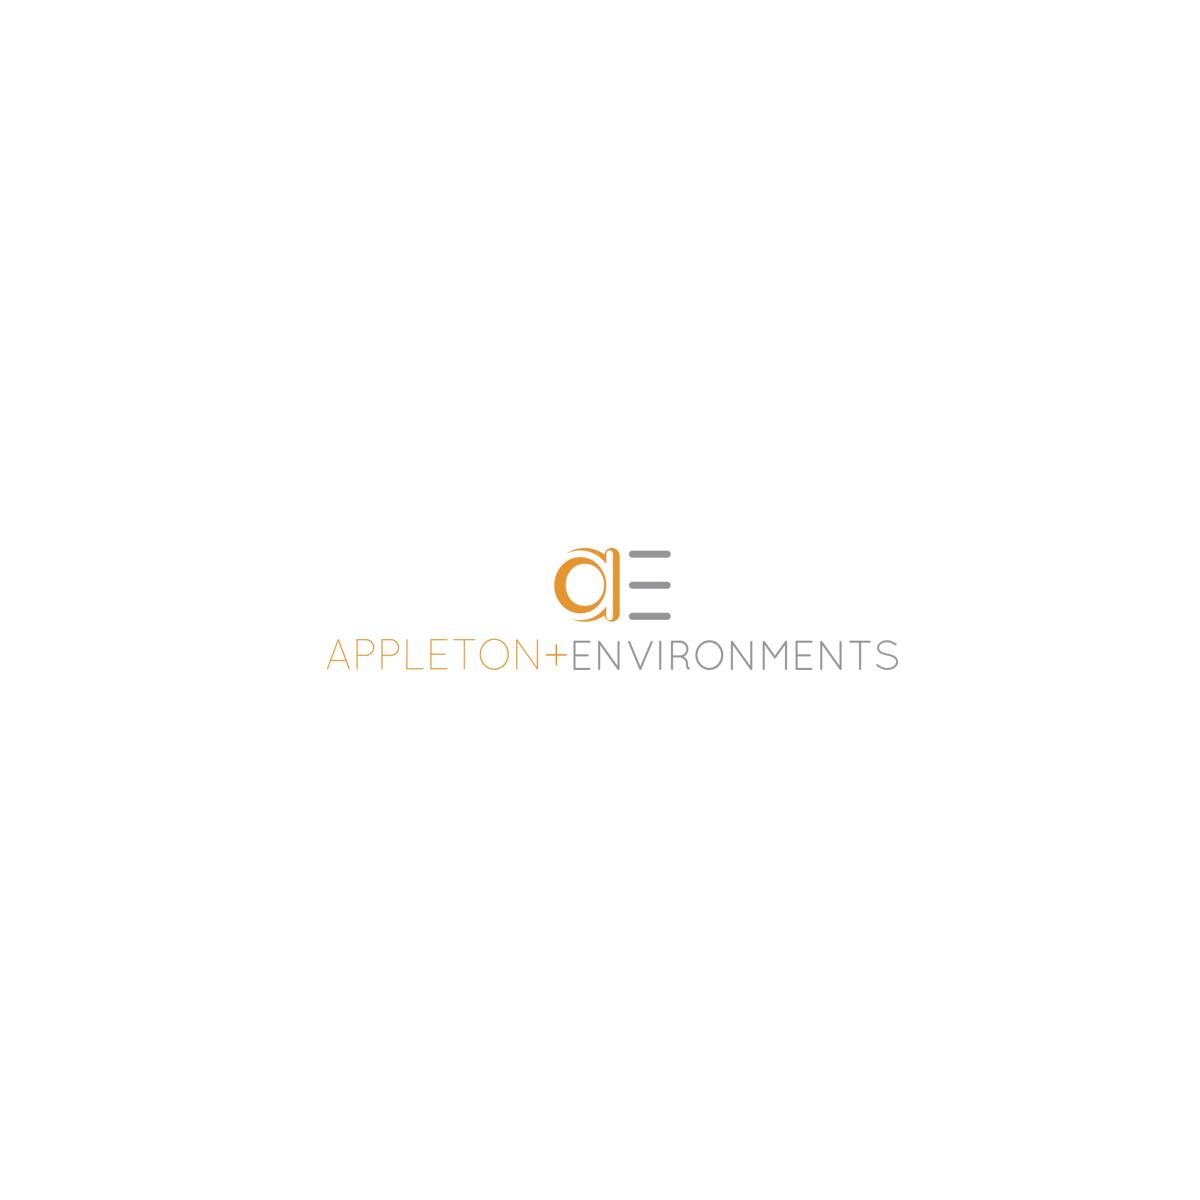 appleton env. logo.png